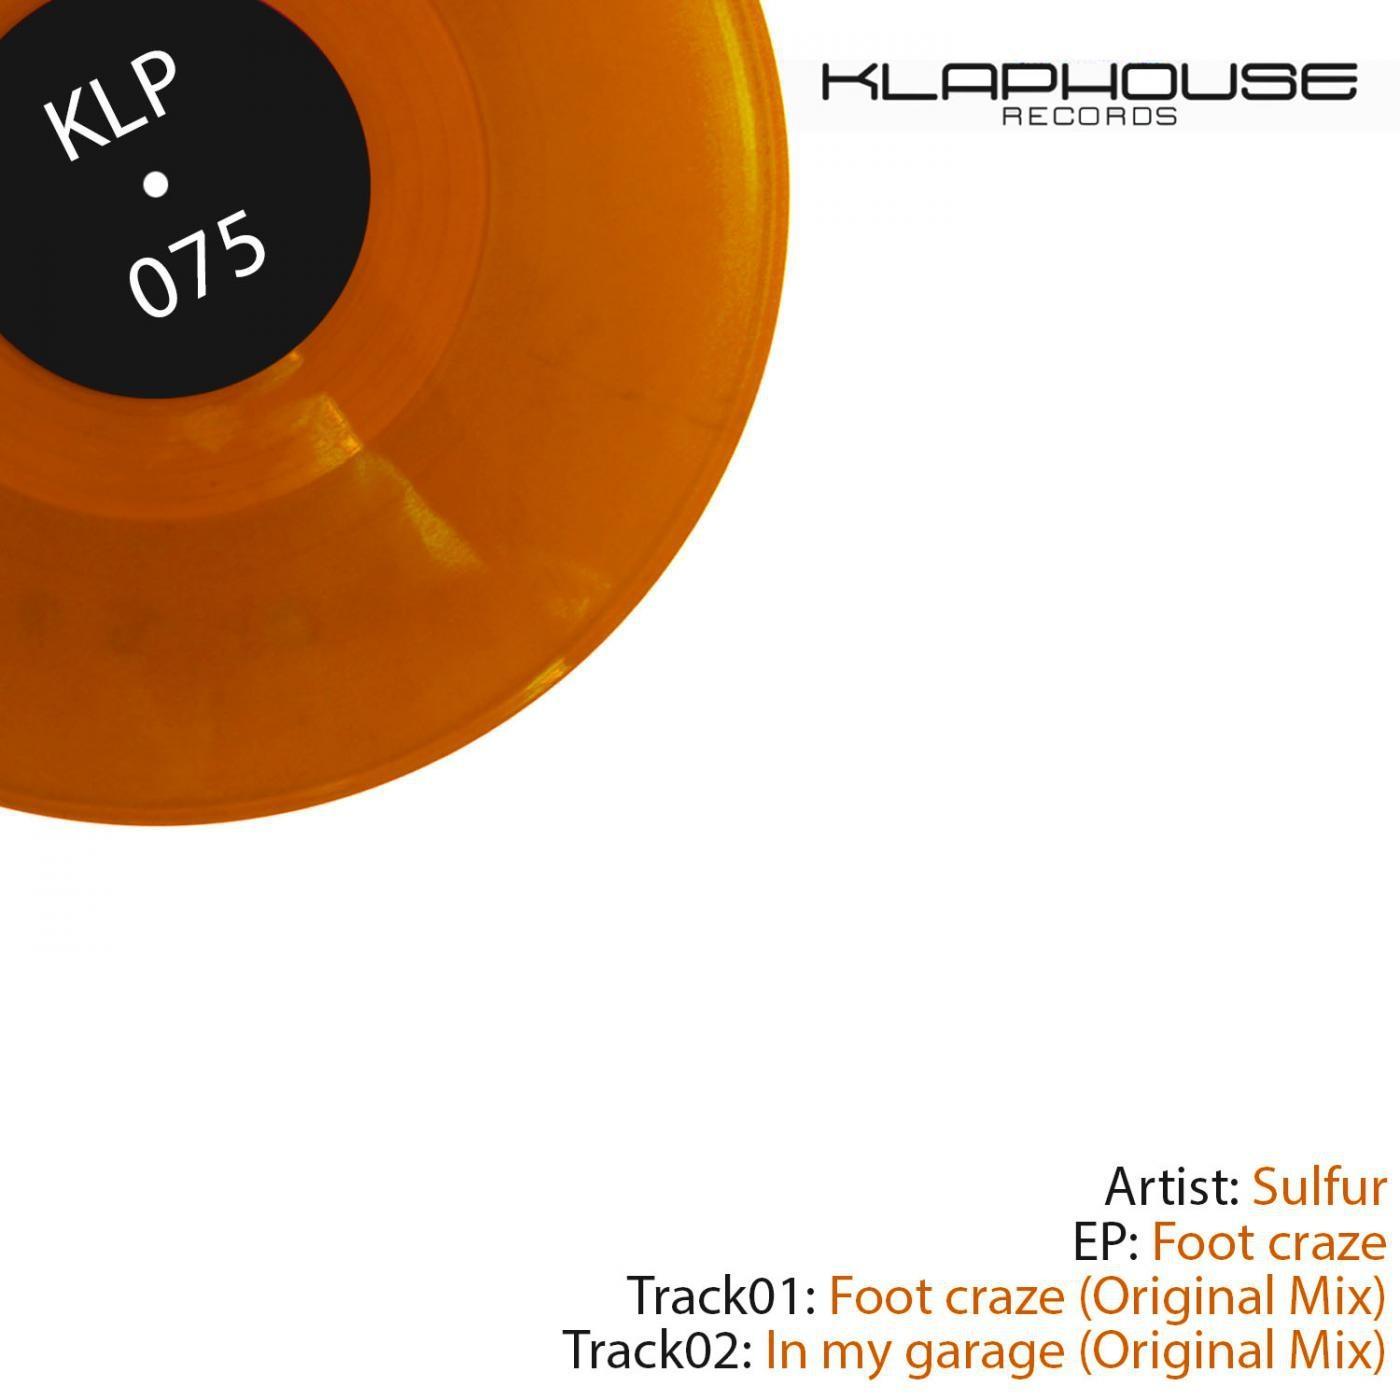 Sulfur - In My Garage (Original mix)